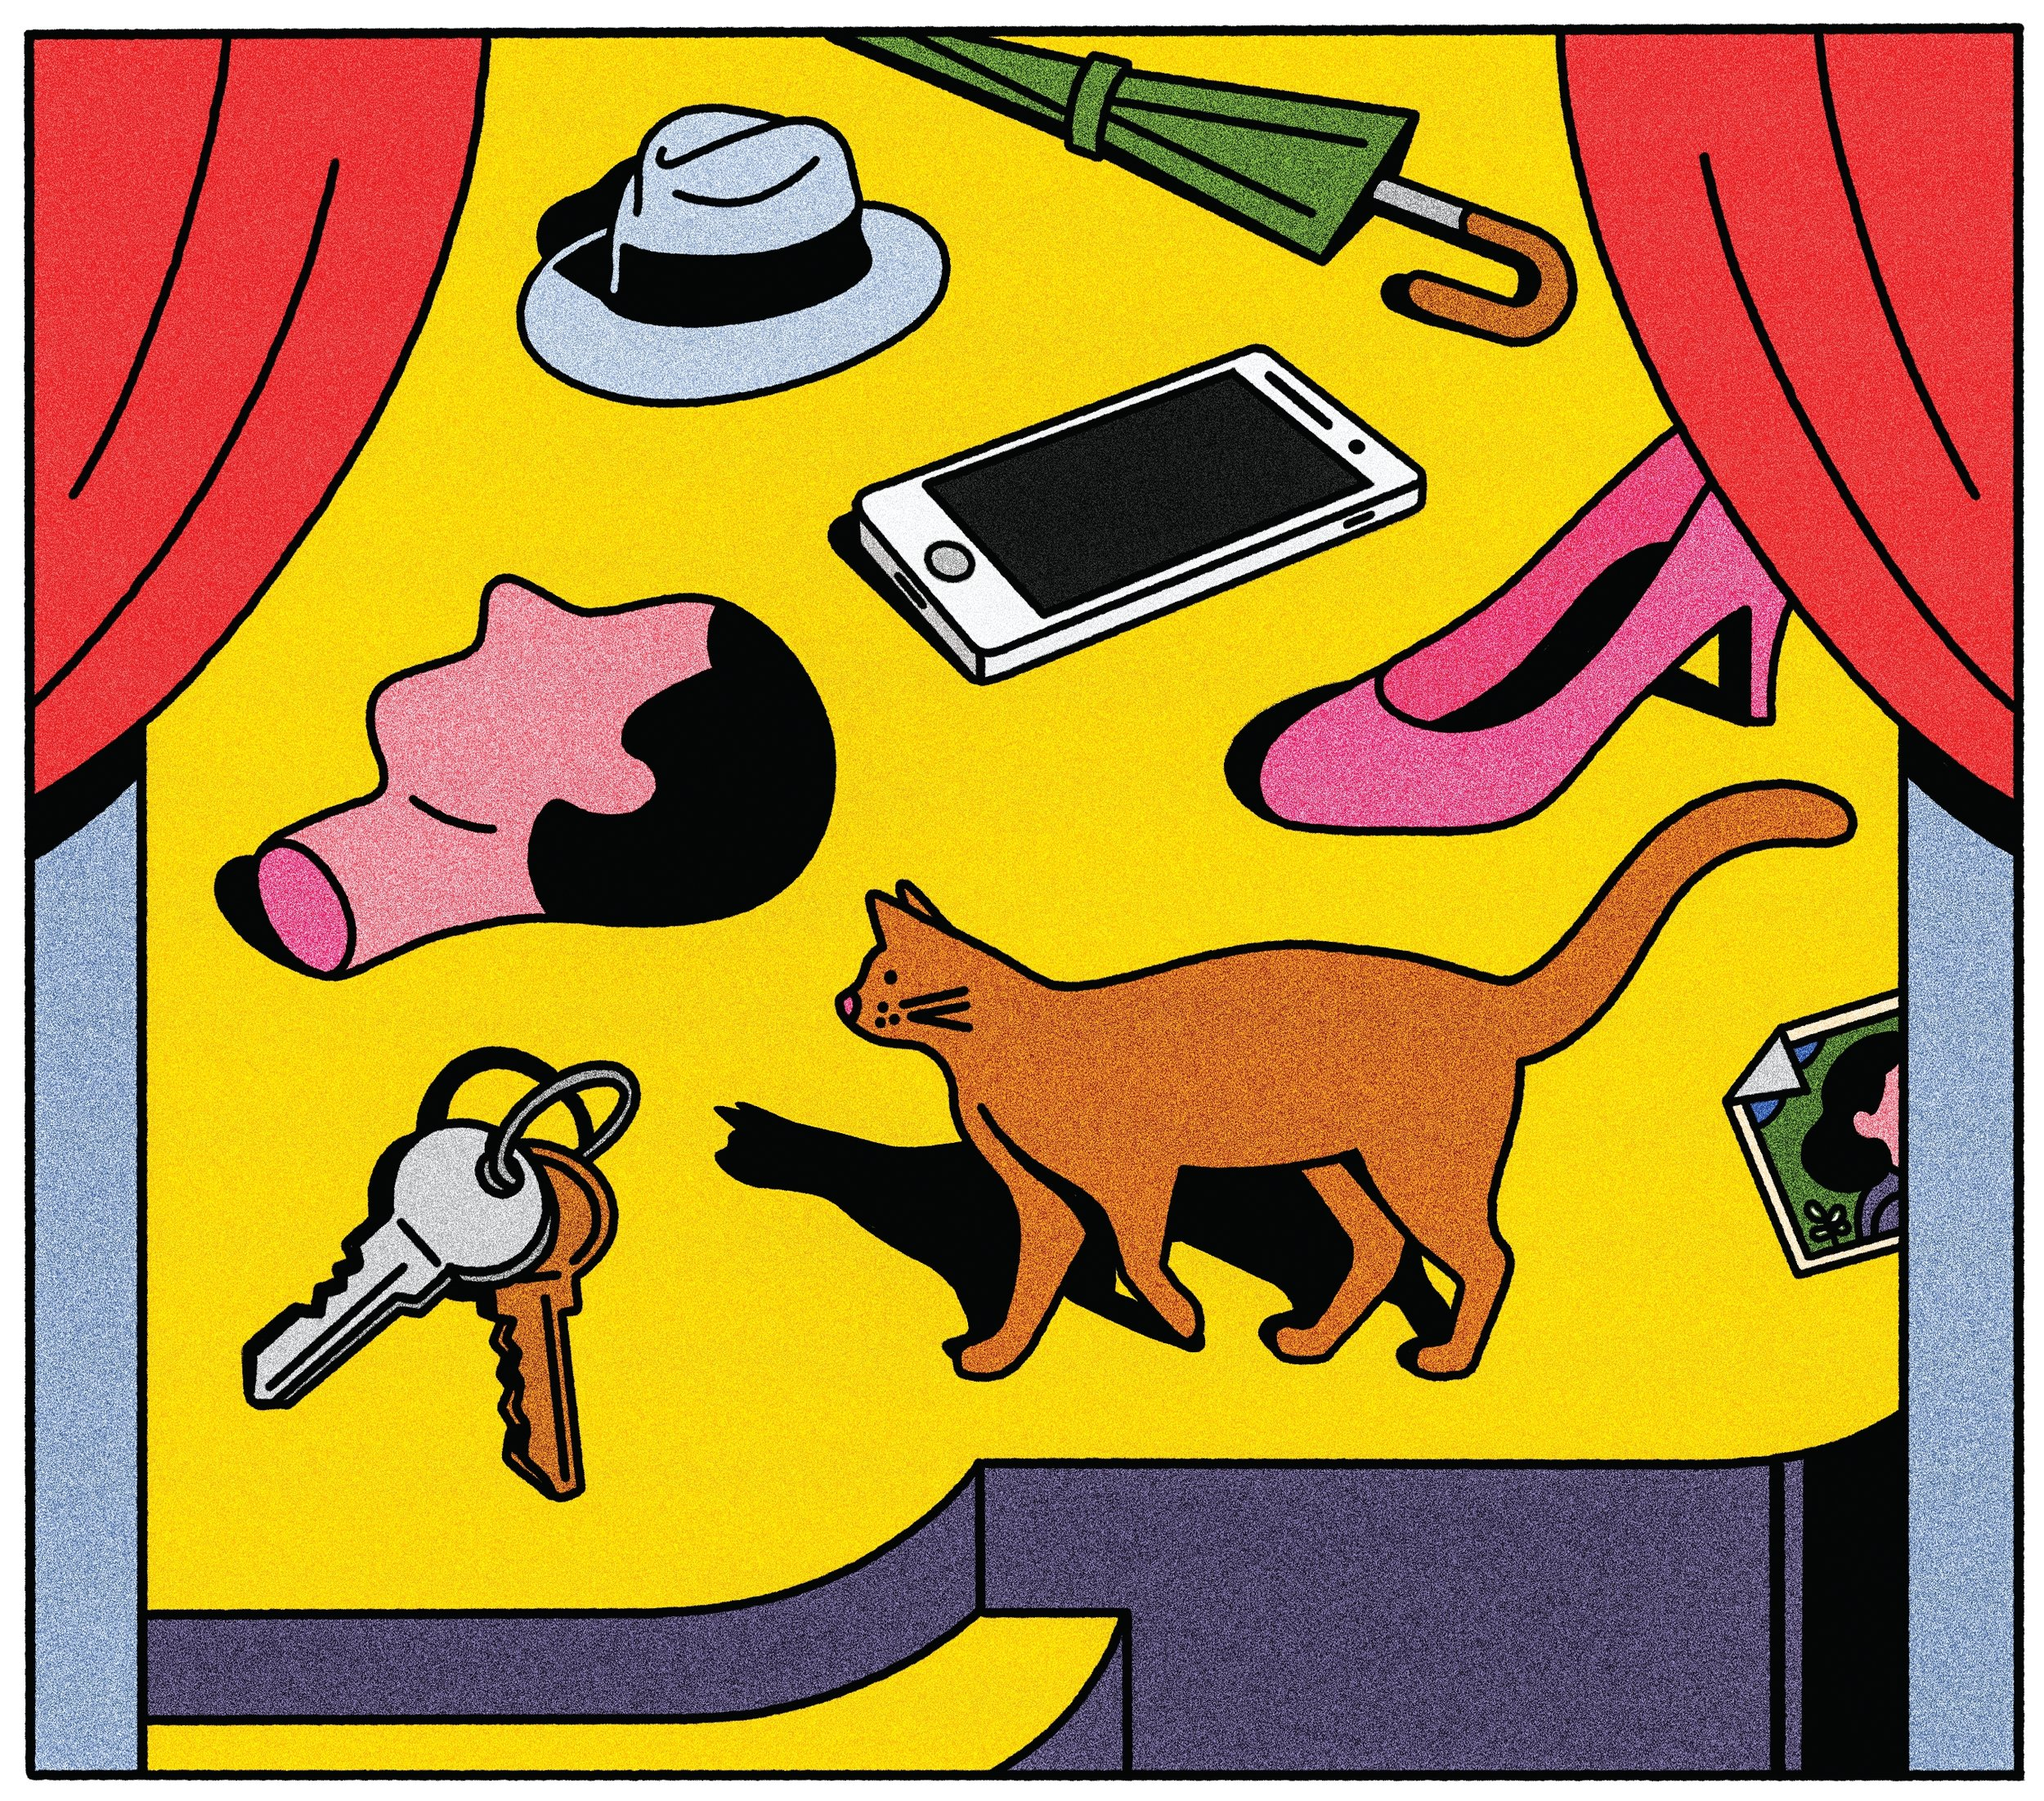 Illustration by Seb Agresti